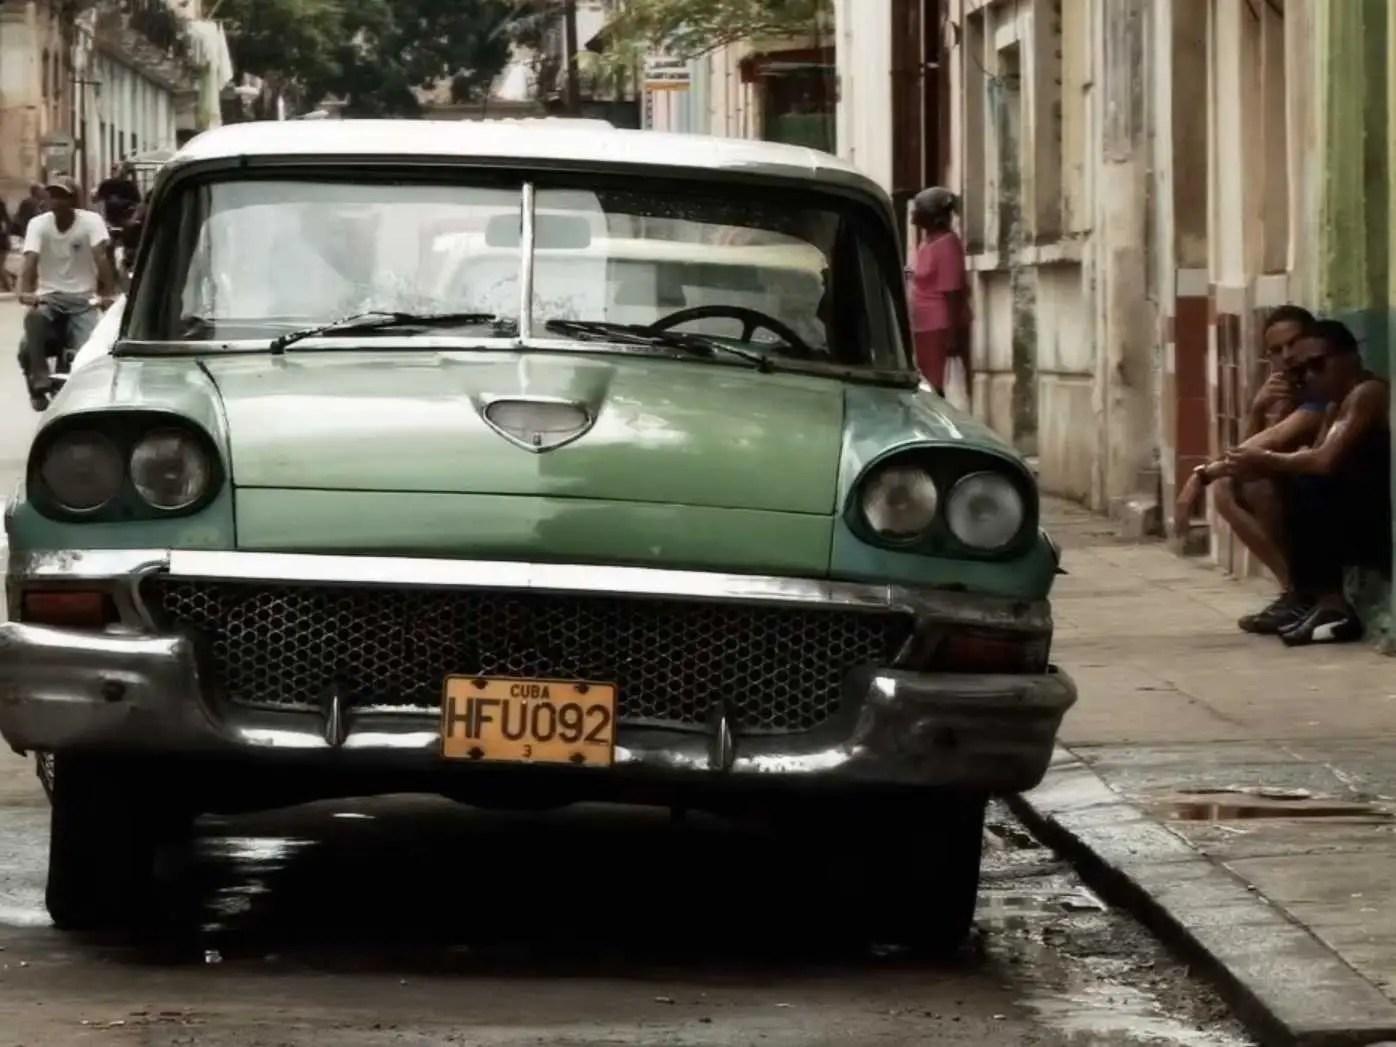 Car on the street in Havana Centro